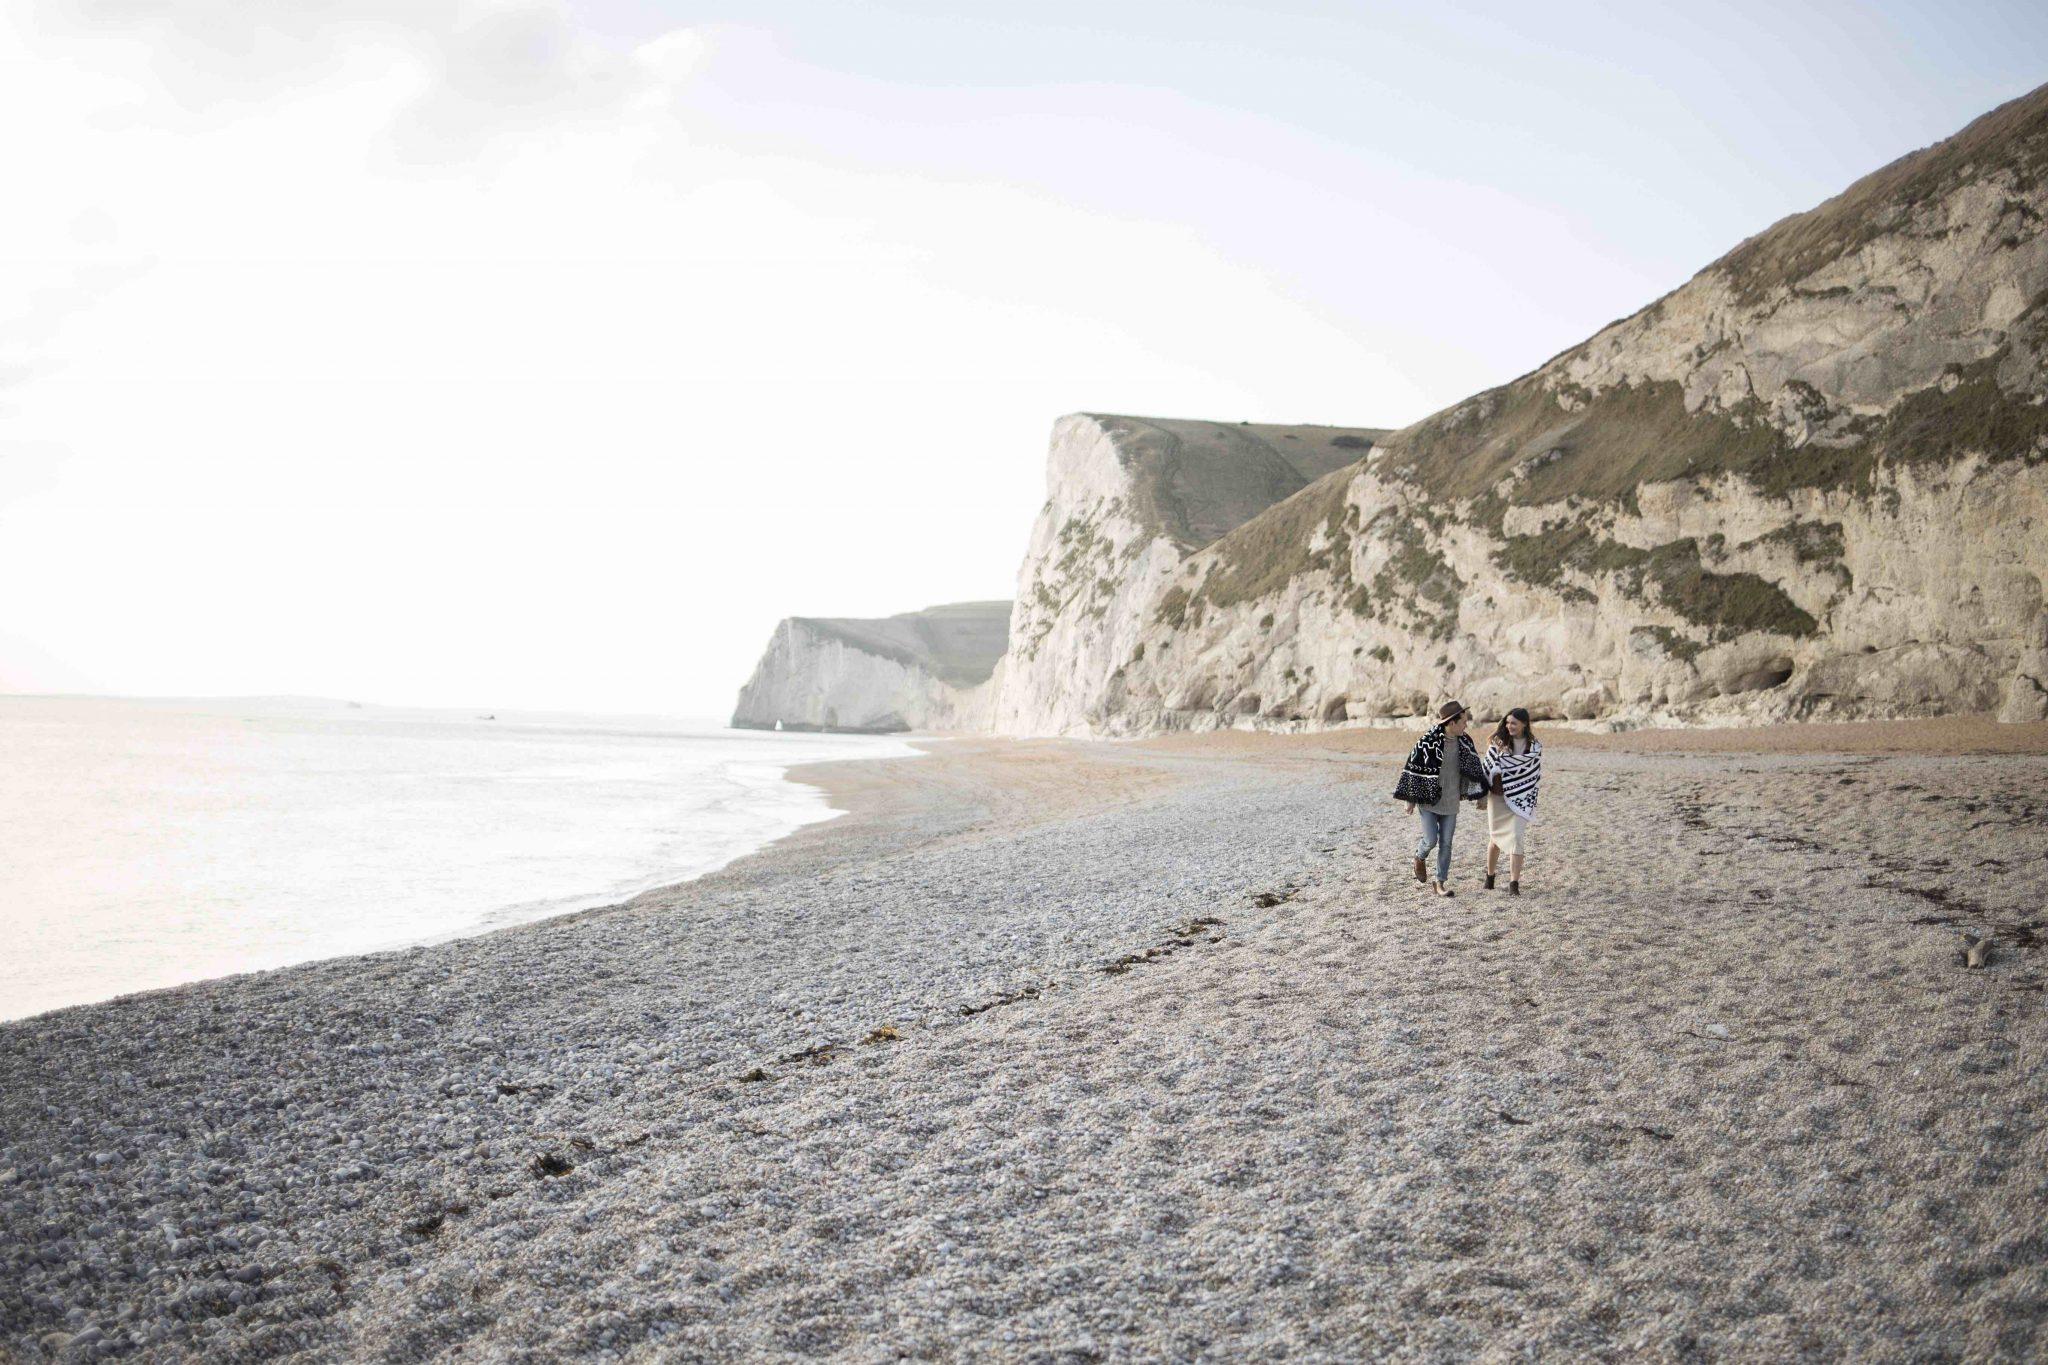 Jordan_Bunker_the_beach_people_8 copy